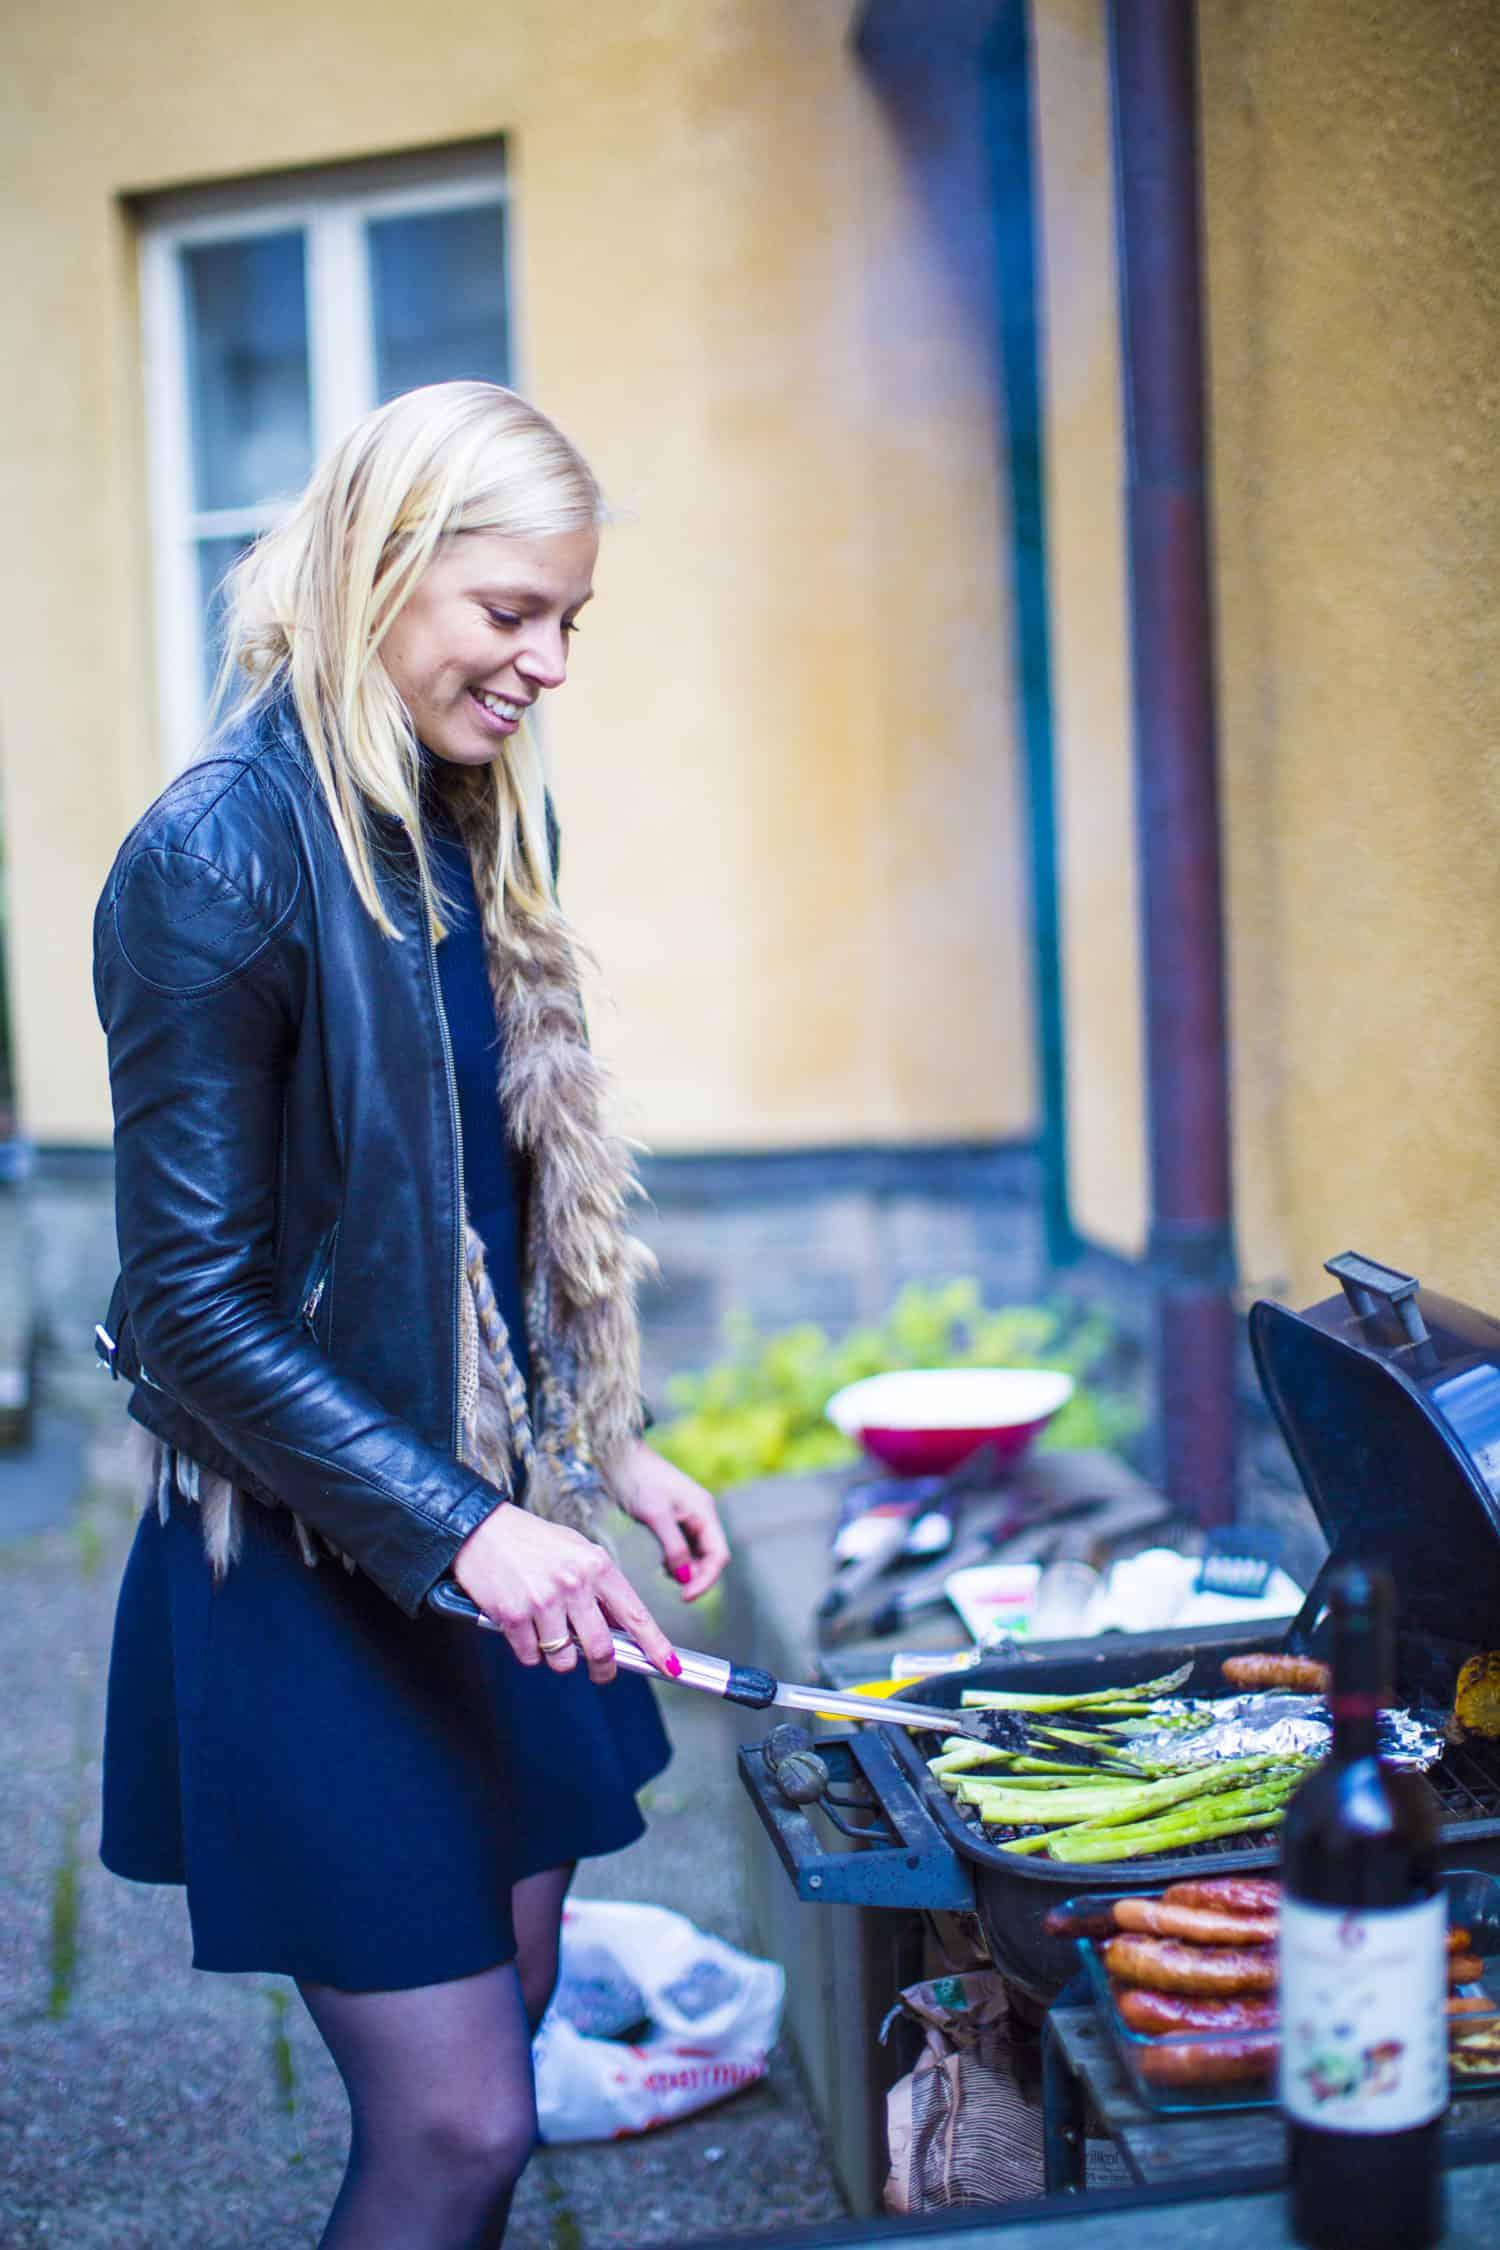 Lovisa grillar Hungry Wines kadarka